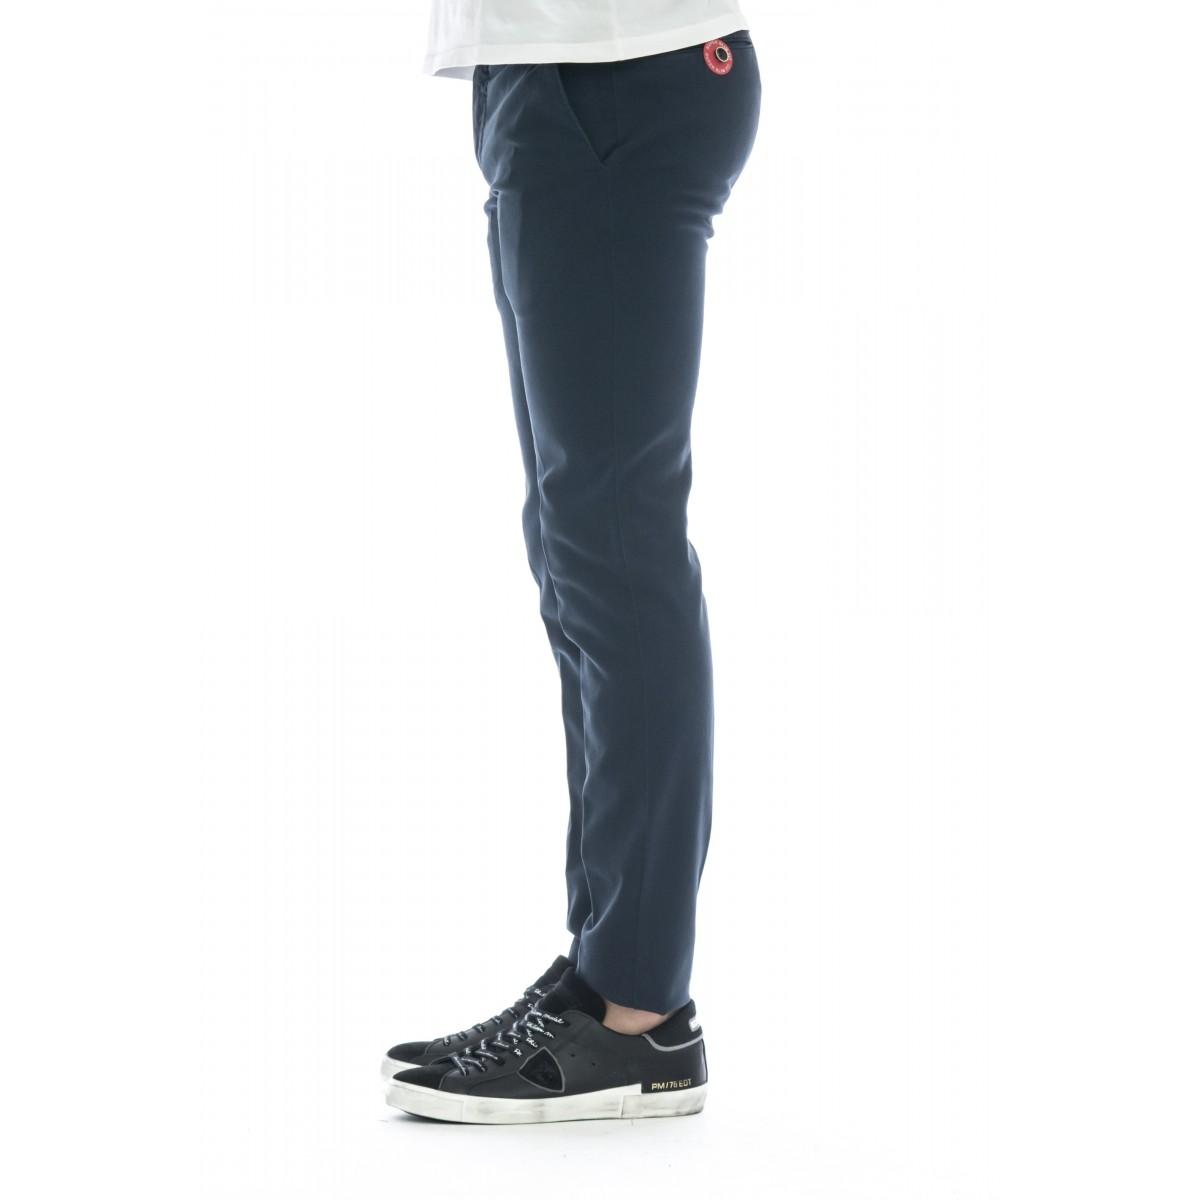 Pantalone uomo - Cpdt01z00he1 super slim twill strech